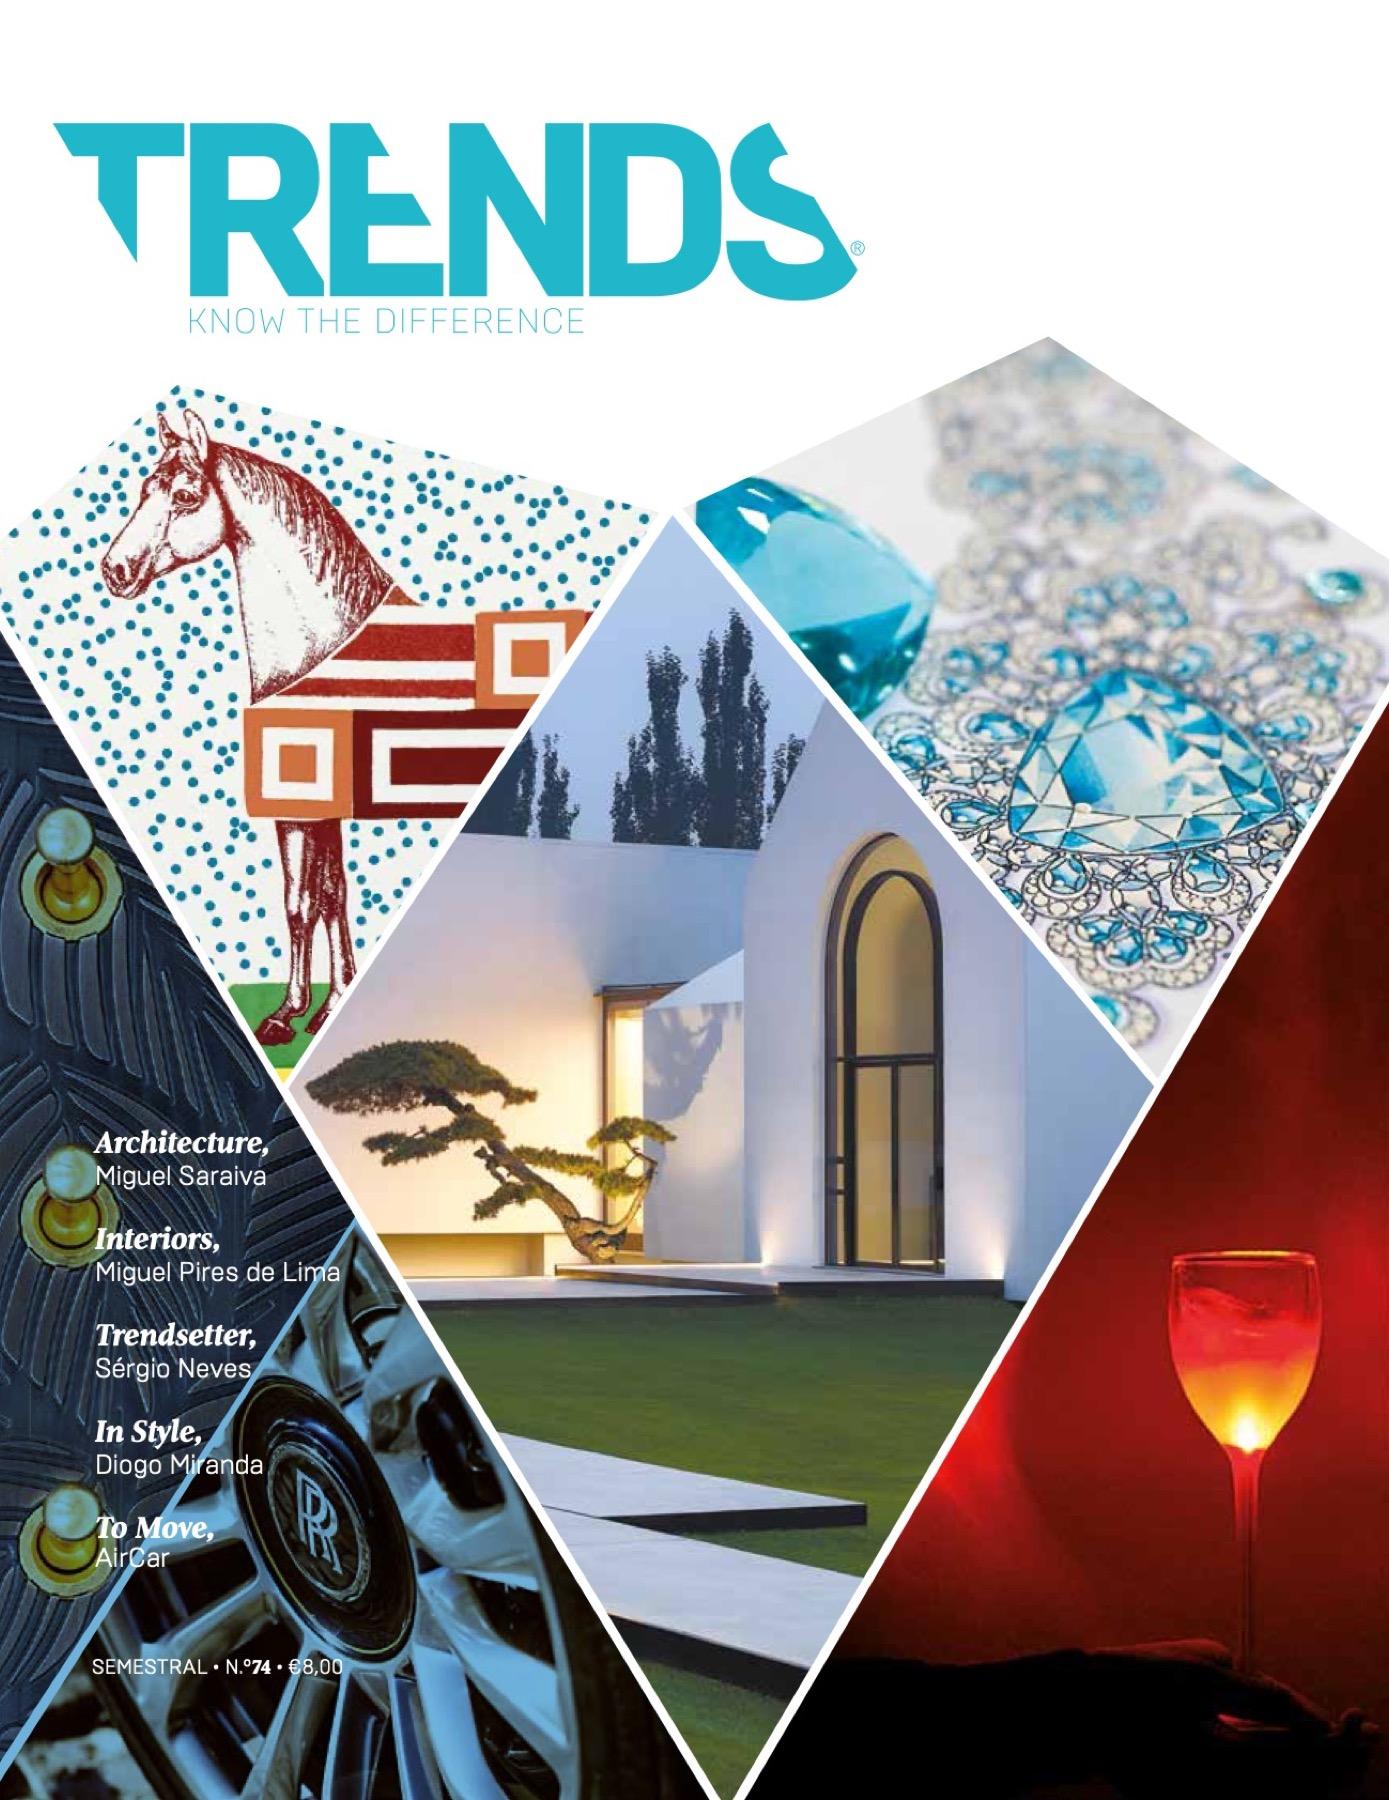 Revista TRENDS com Floret Arquitectura, Ren Ito, REM'A e Paulo Merlini